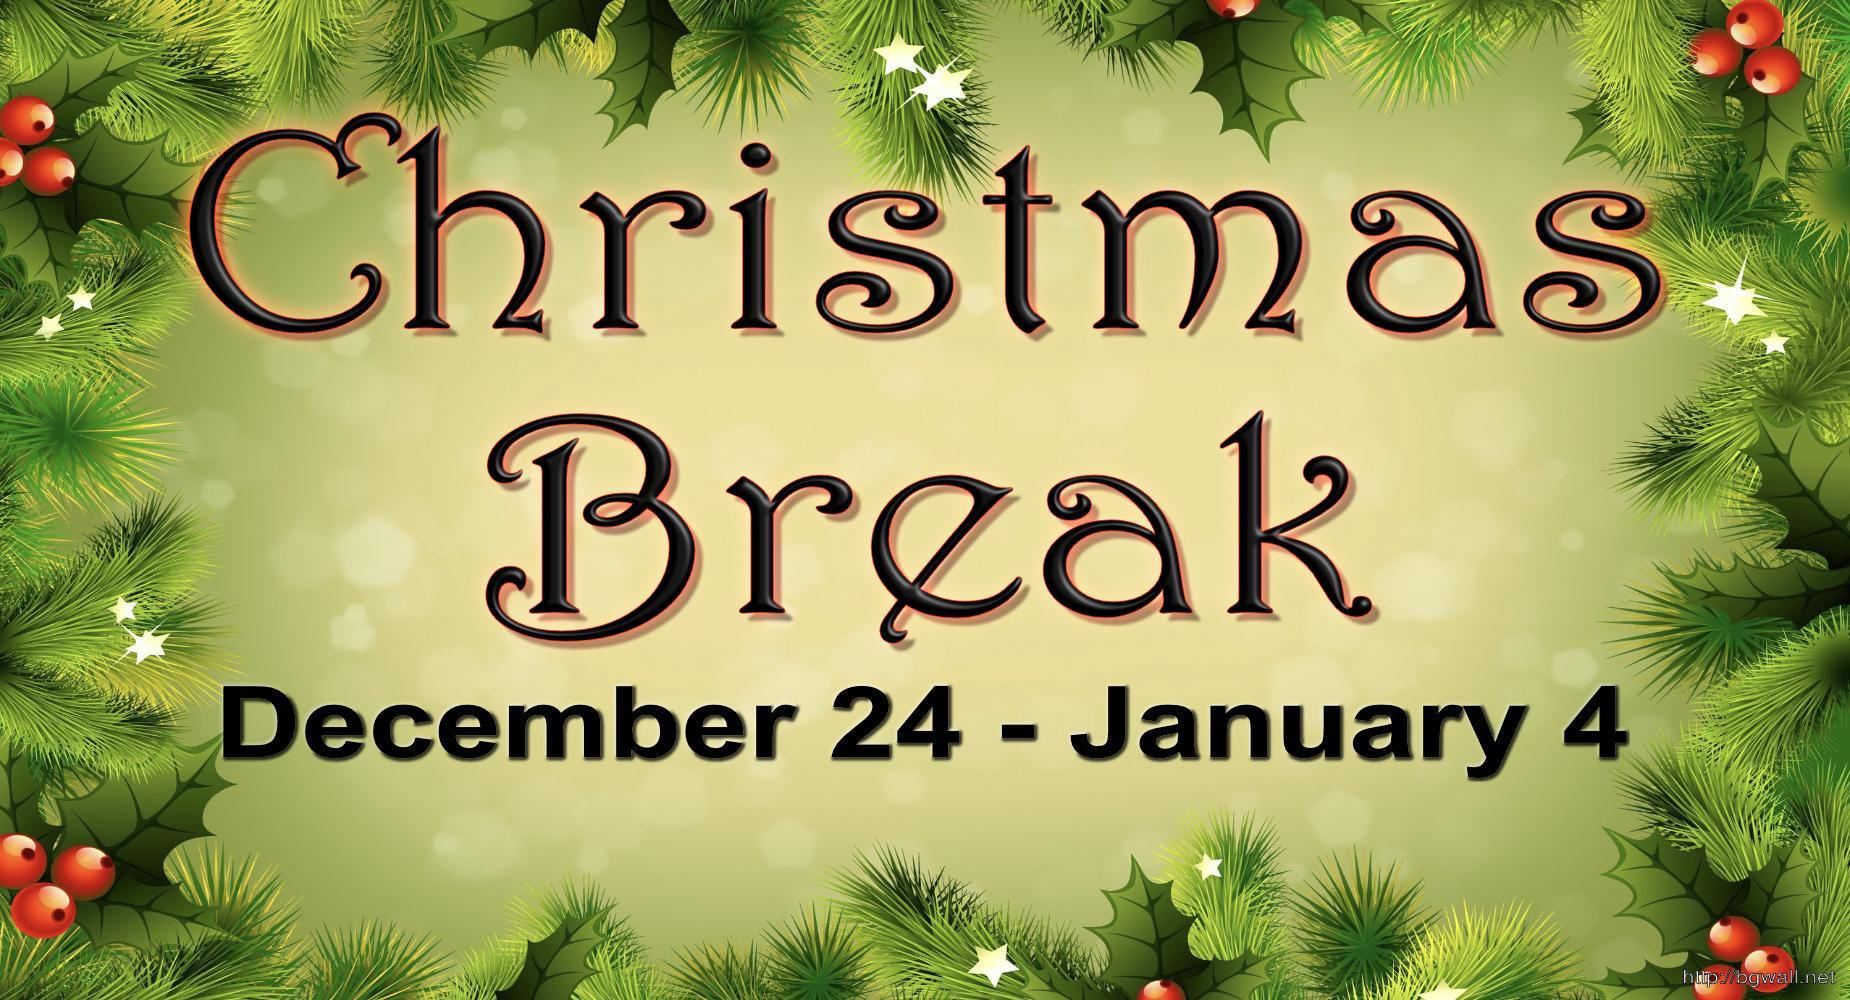 Christmas Break --- Dec. 24 - Jan. 4